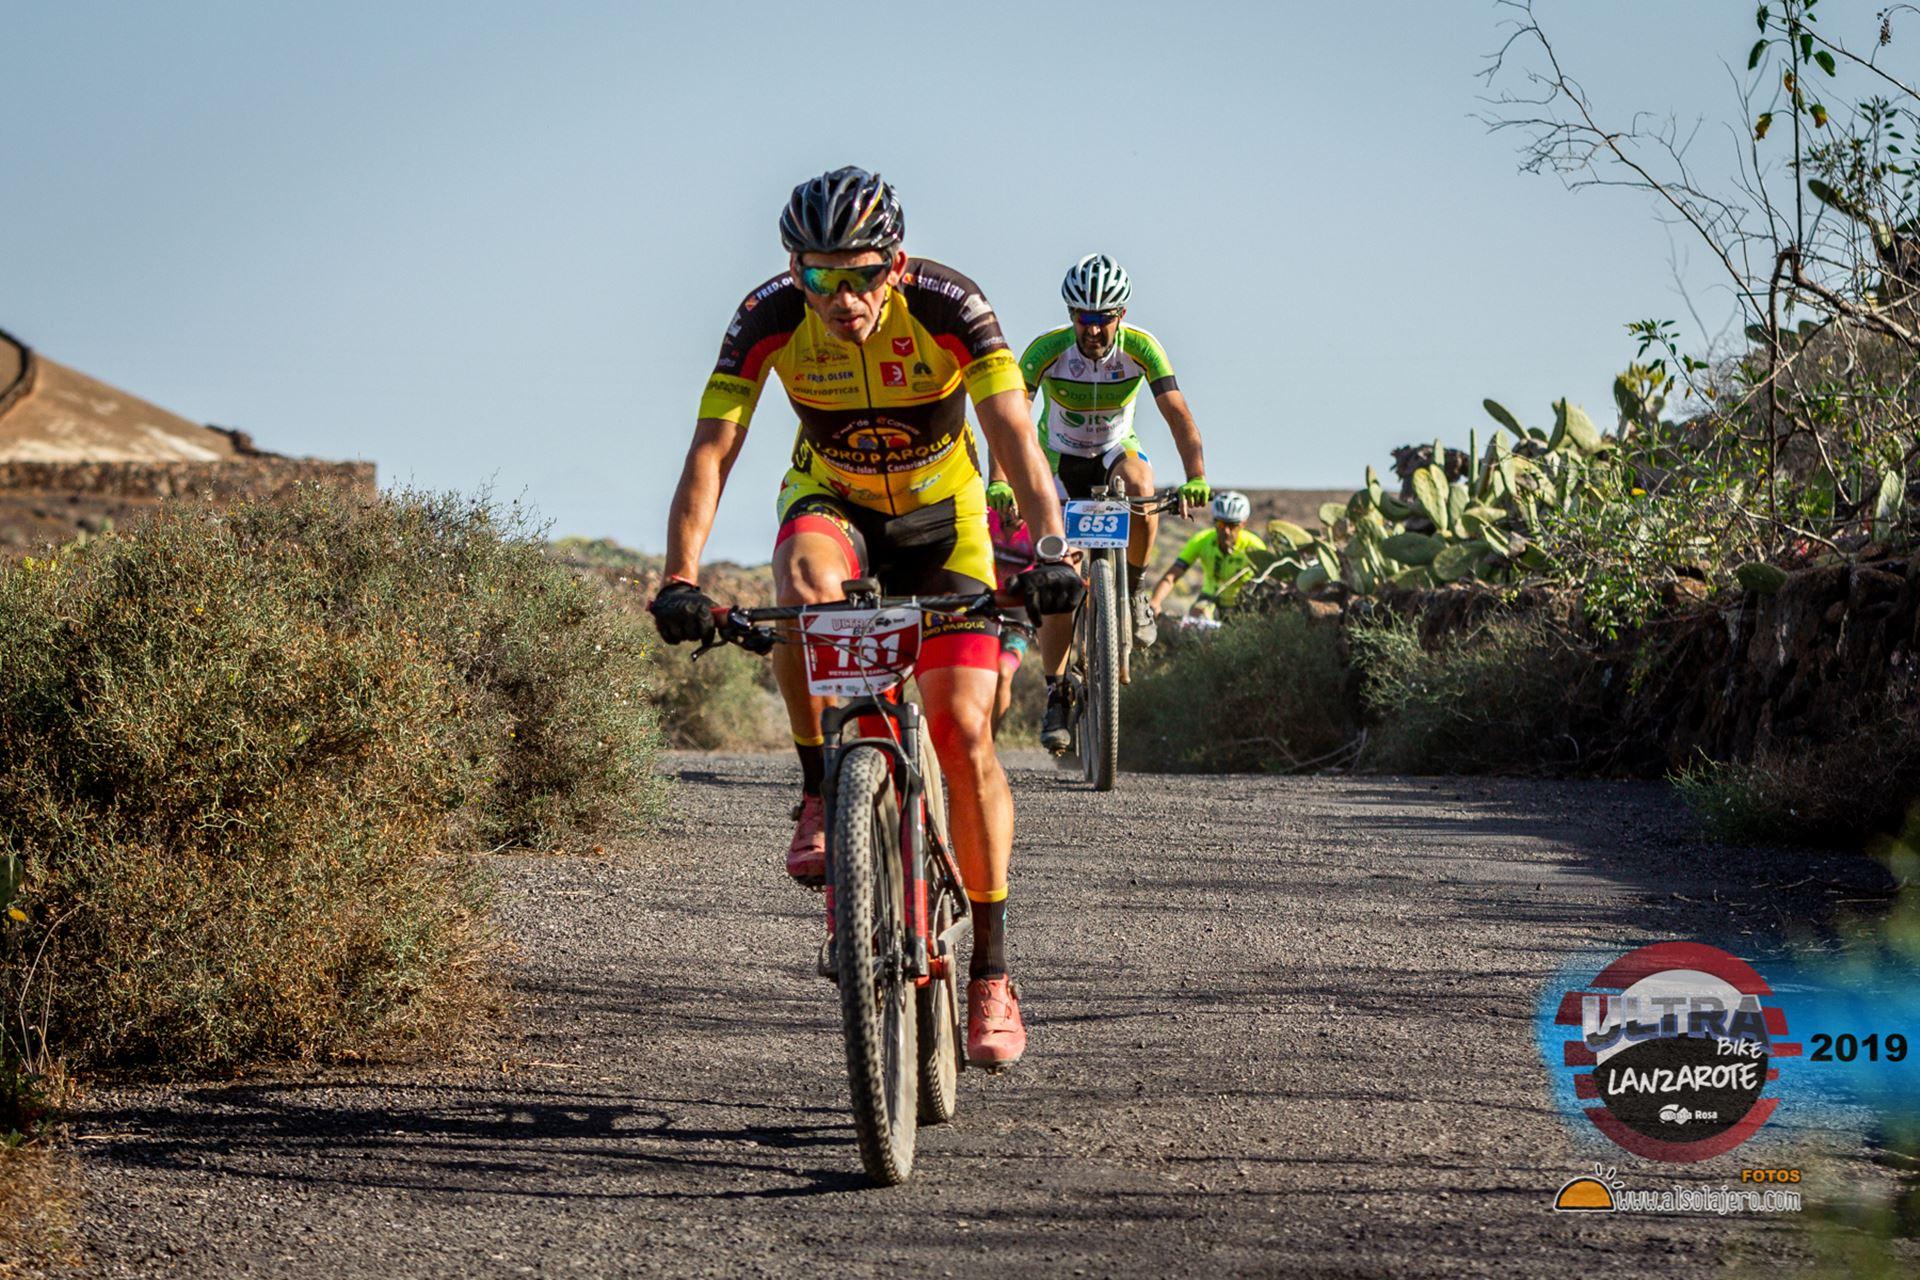 Sector Guatiza 2ª Etapa Ultrabike 2019 Fotos Alsolajero.com-111